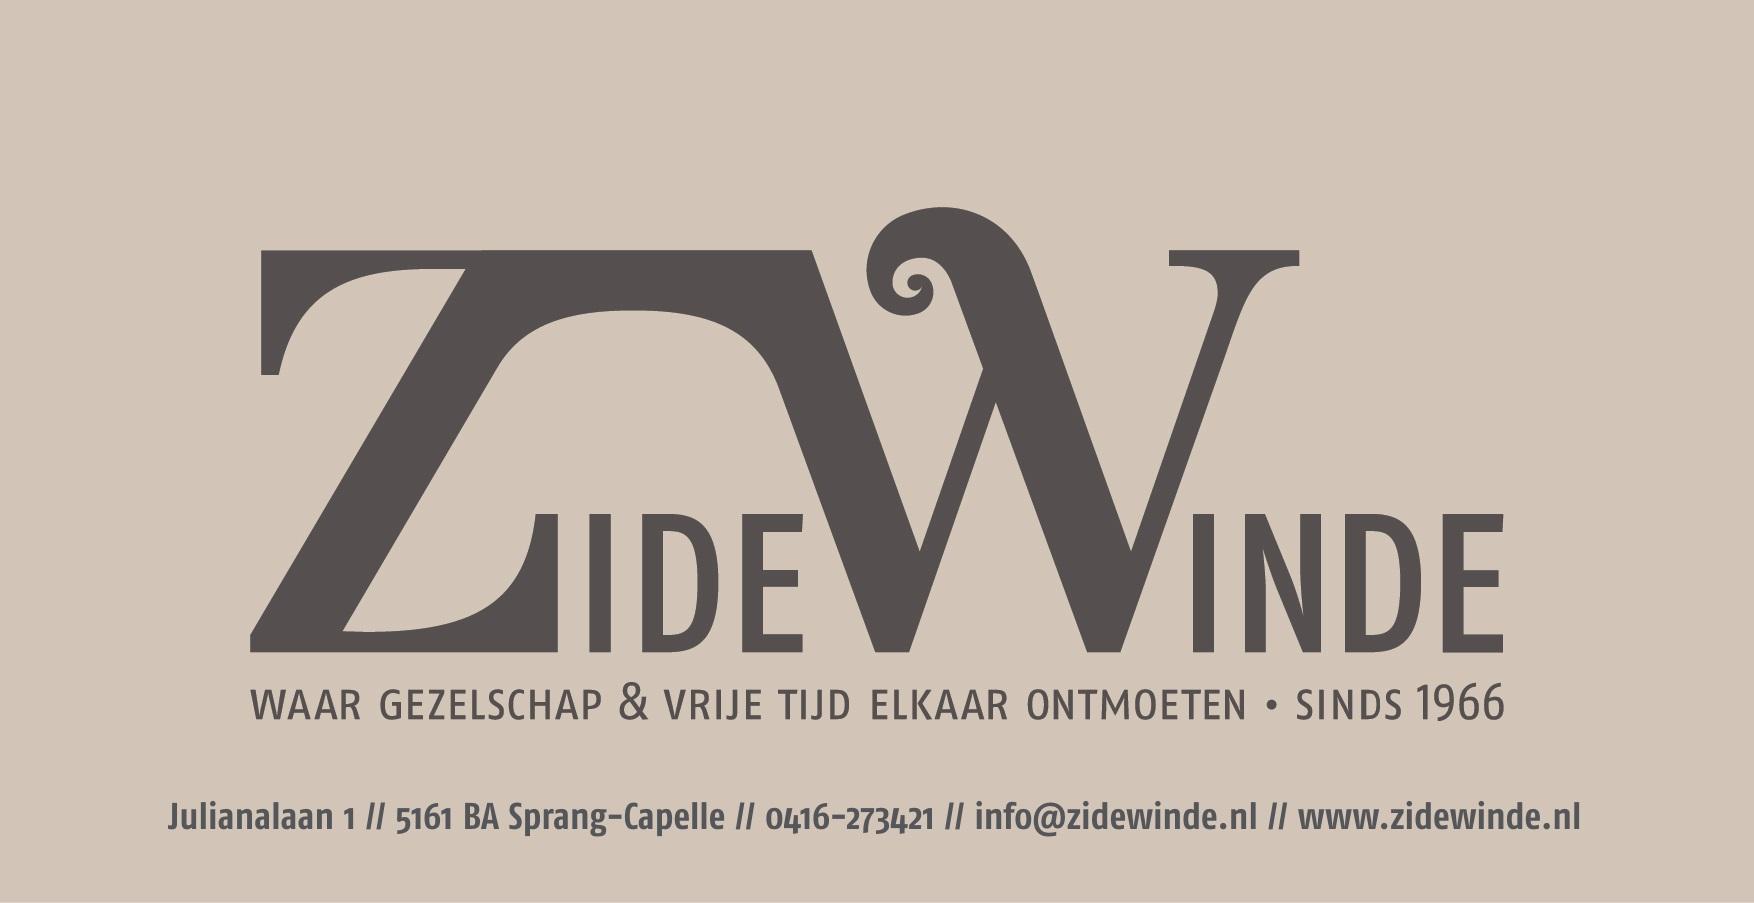 logo Zidewinde